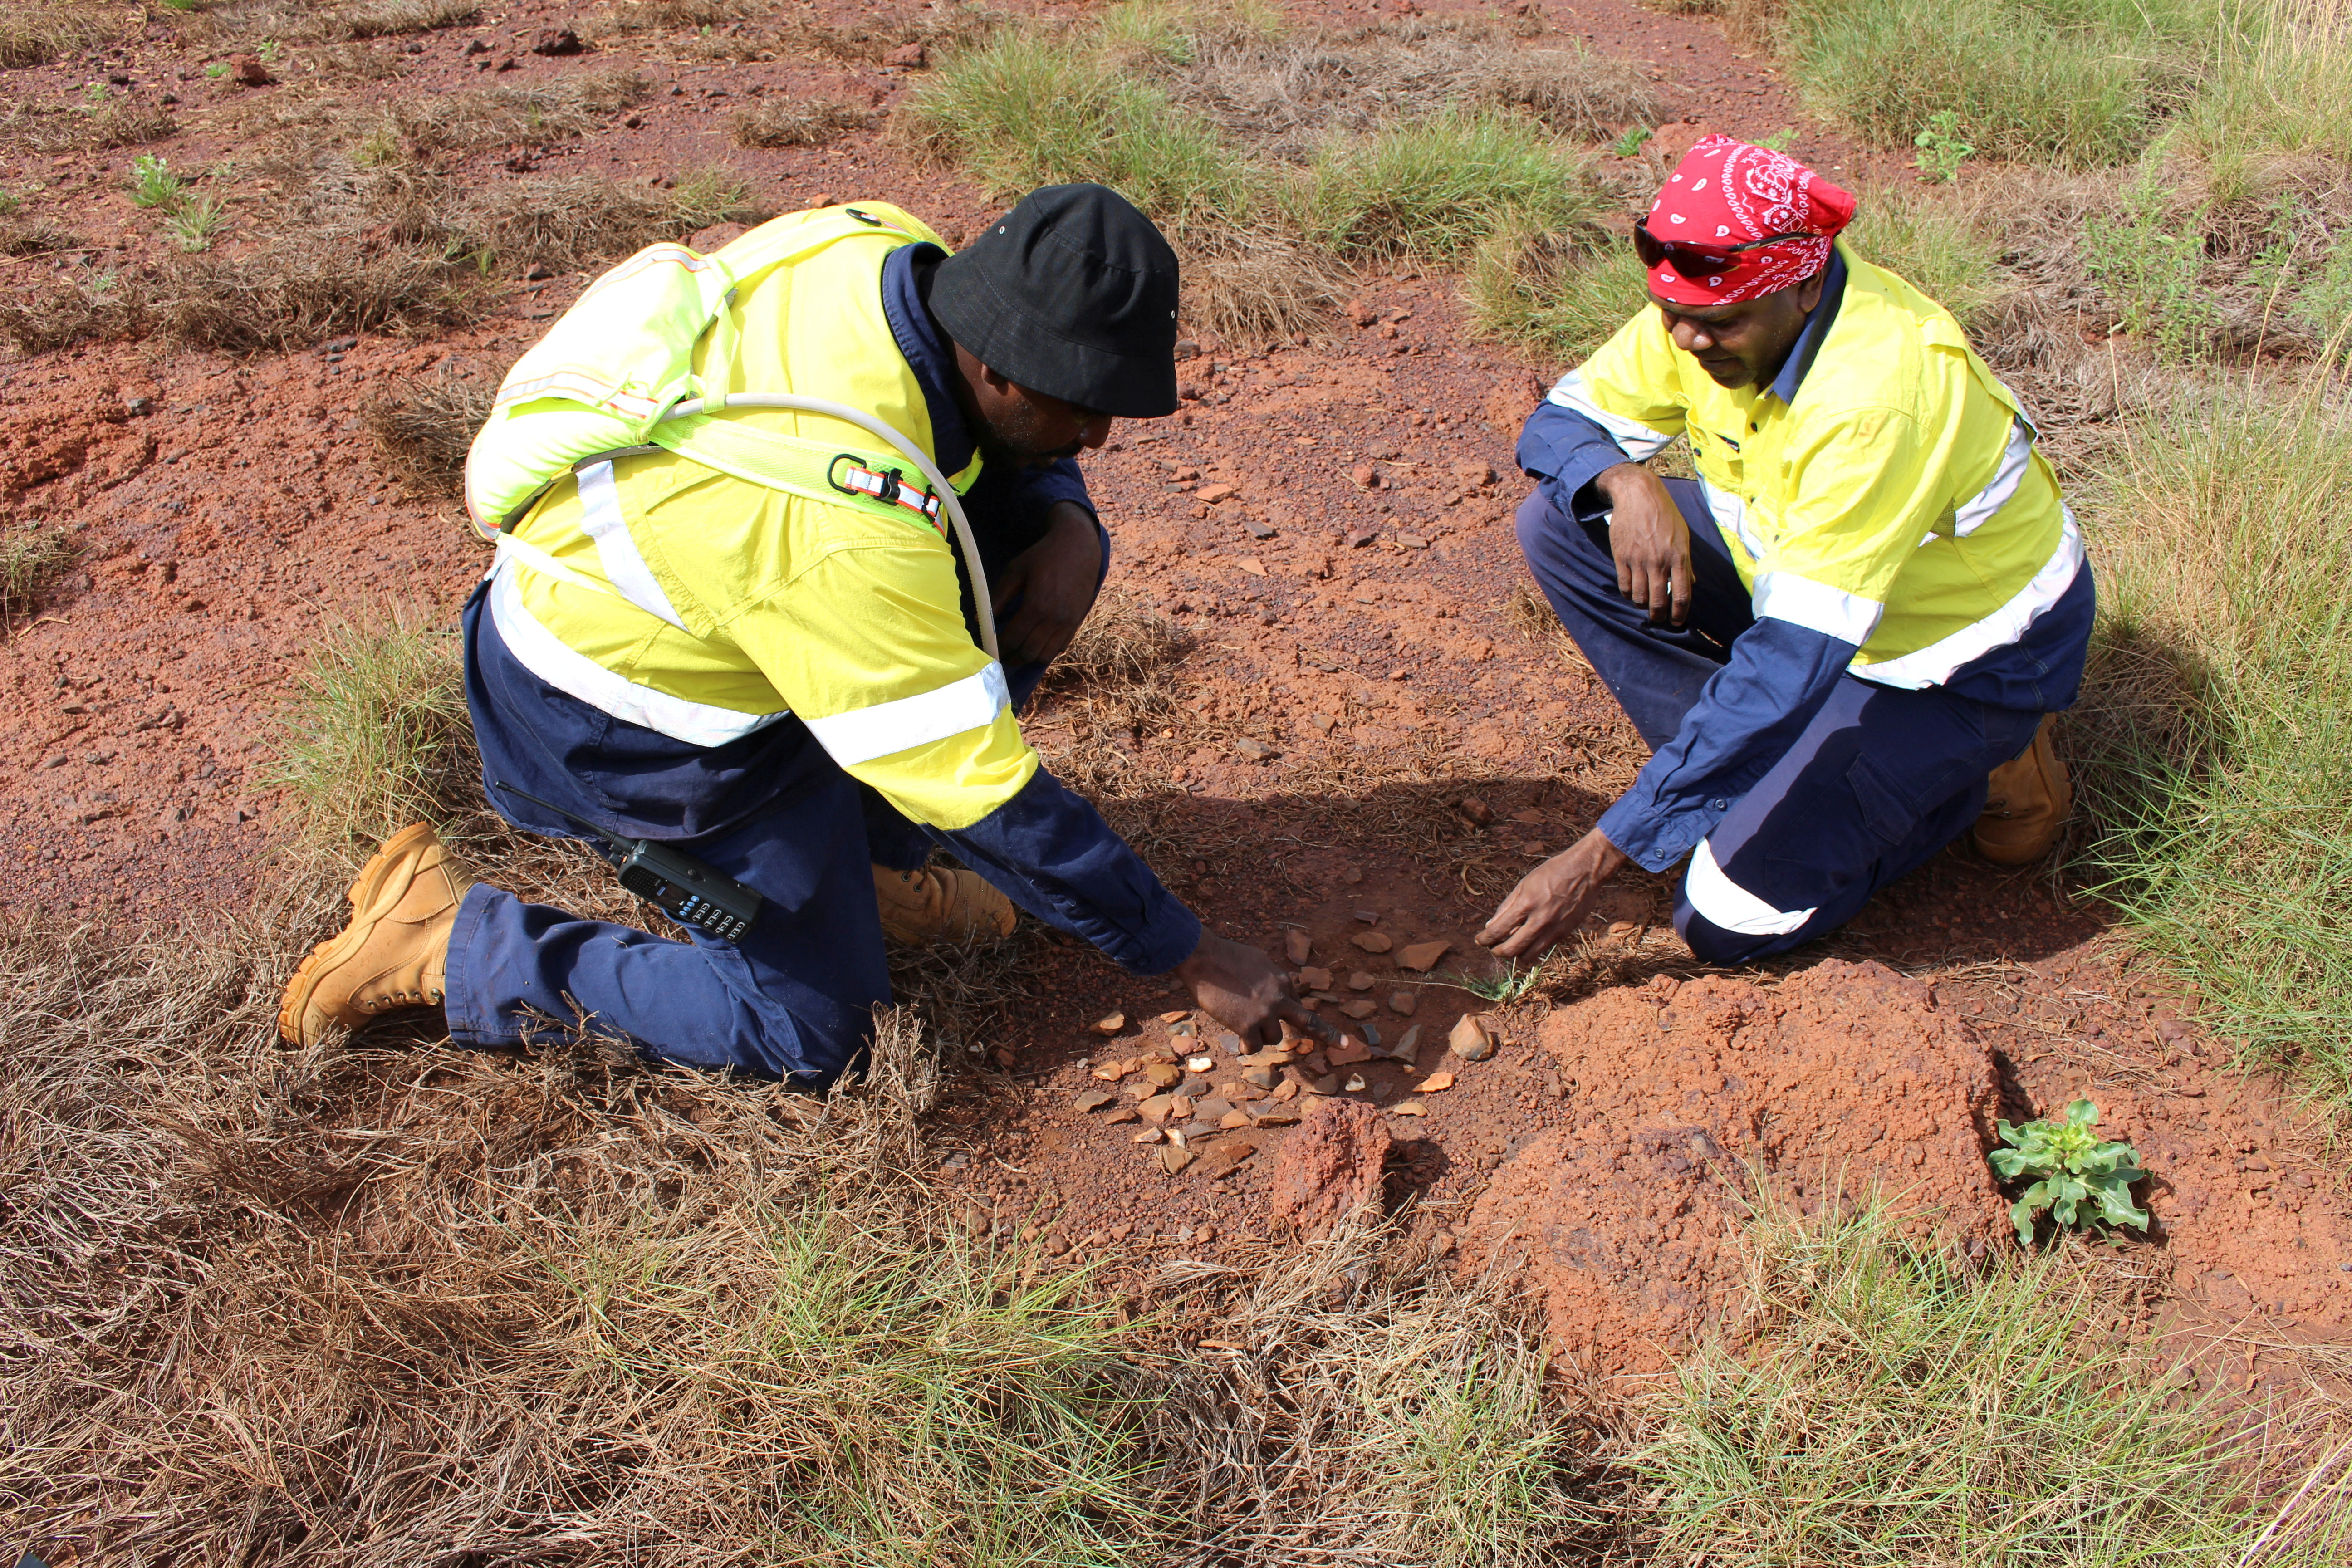 Puutu Kunti Kurrama and Pinikura (PKKP) Project Advisor John Ashburton (R) works on the collection of scatterings in the Pilbara region of Western Australia, May 10, 2021.  Puutu Kunti Kurrama and Pinikura (PKKP)/Handout via REUTERS